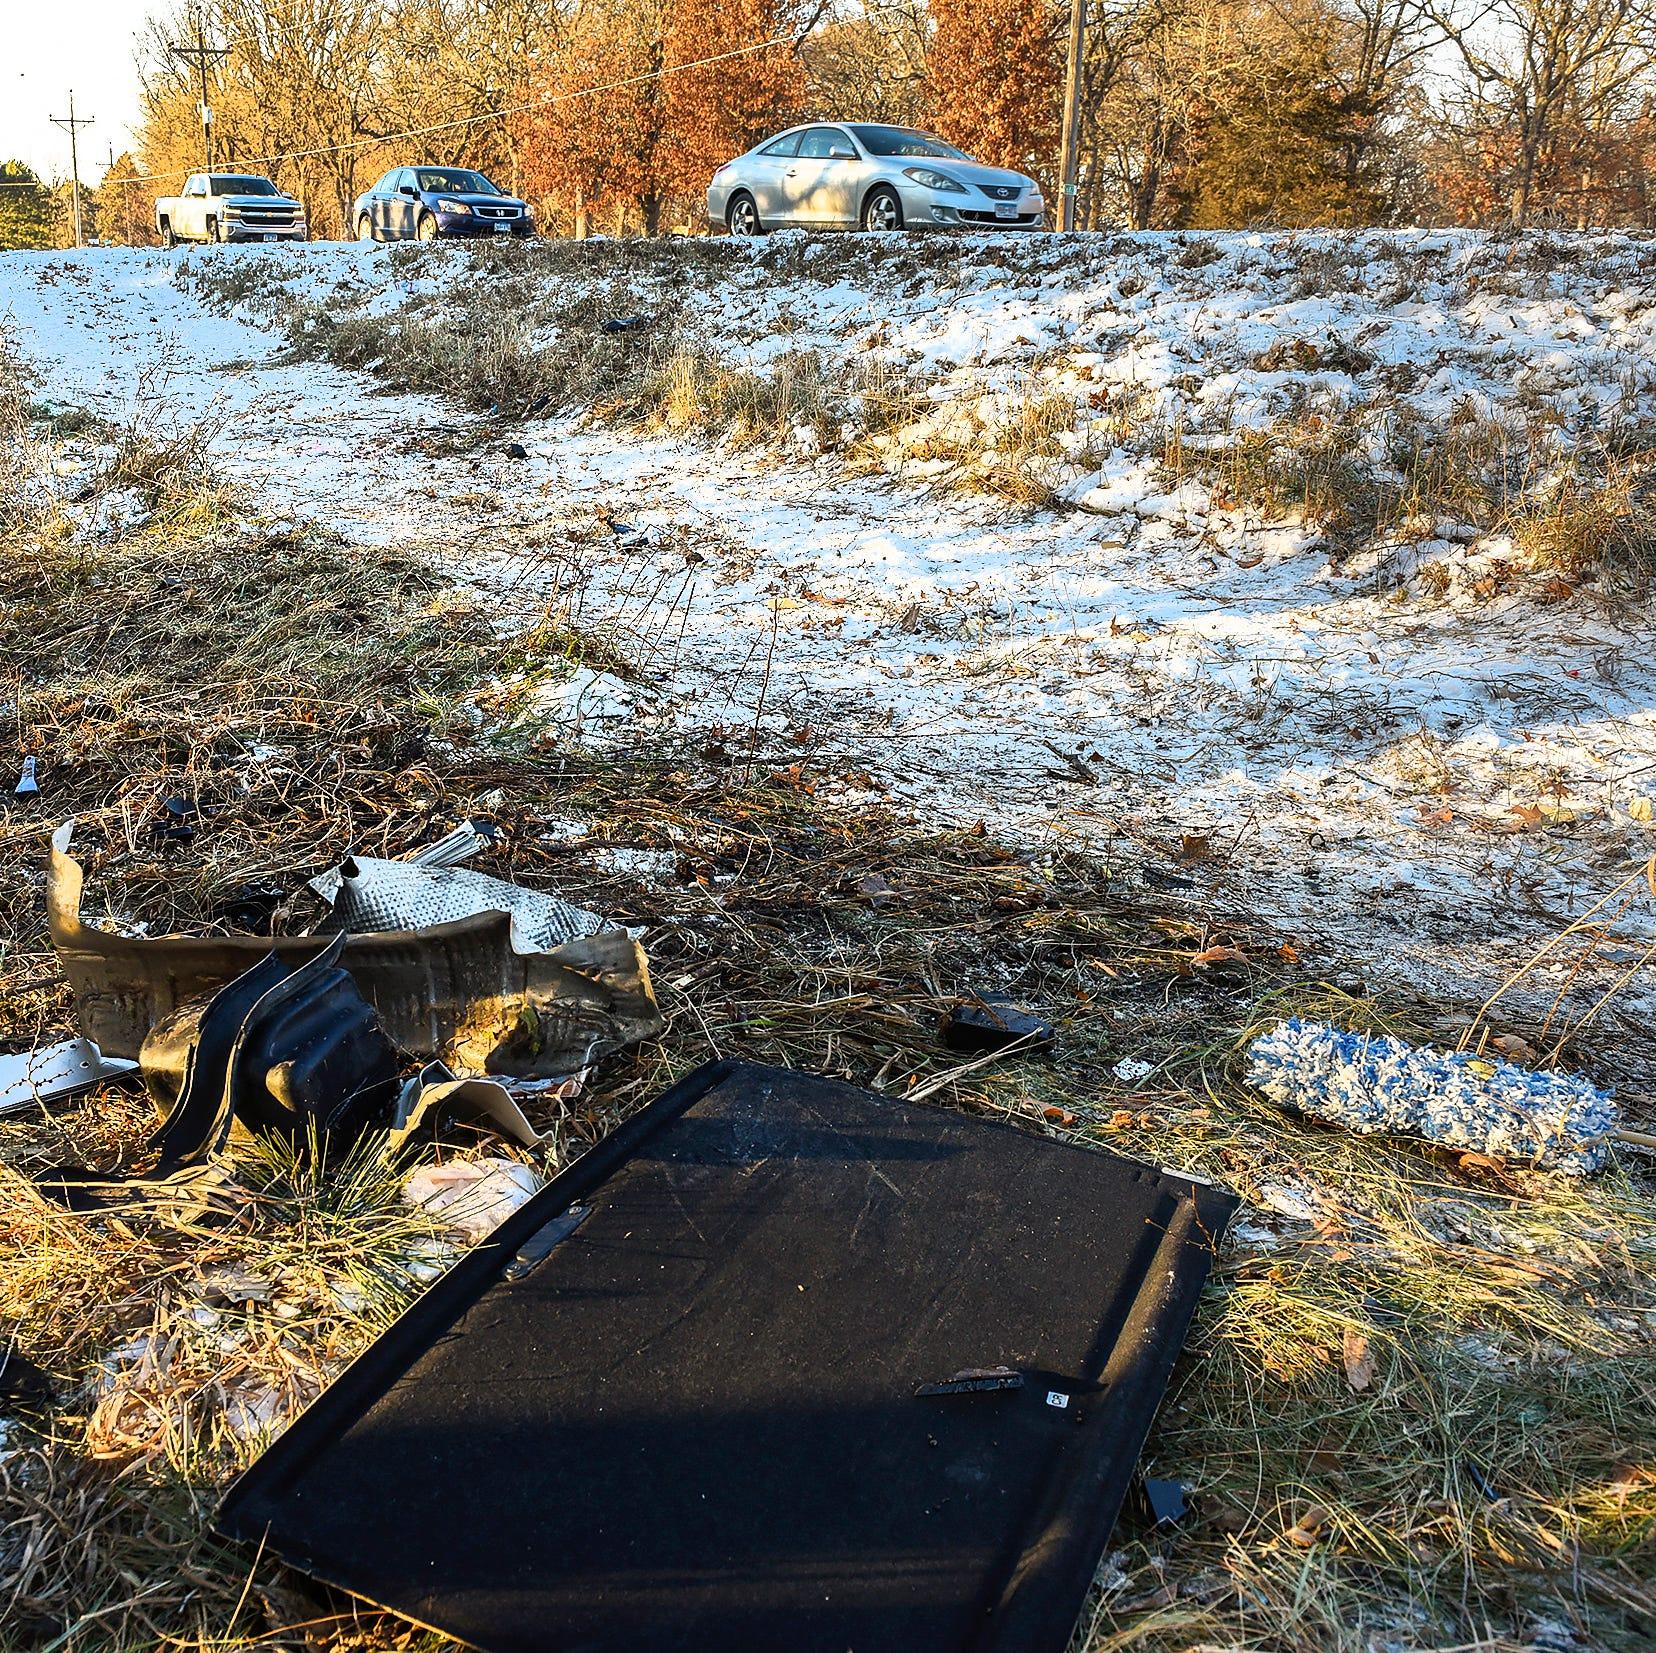 2 men killed in stolen Lyft car crash identified